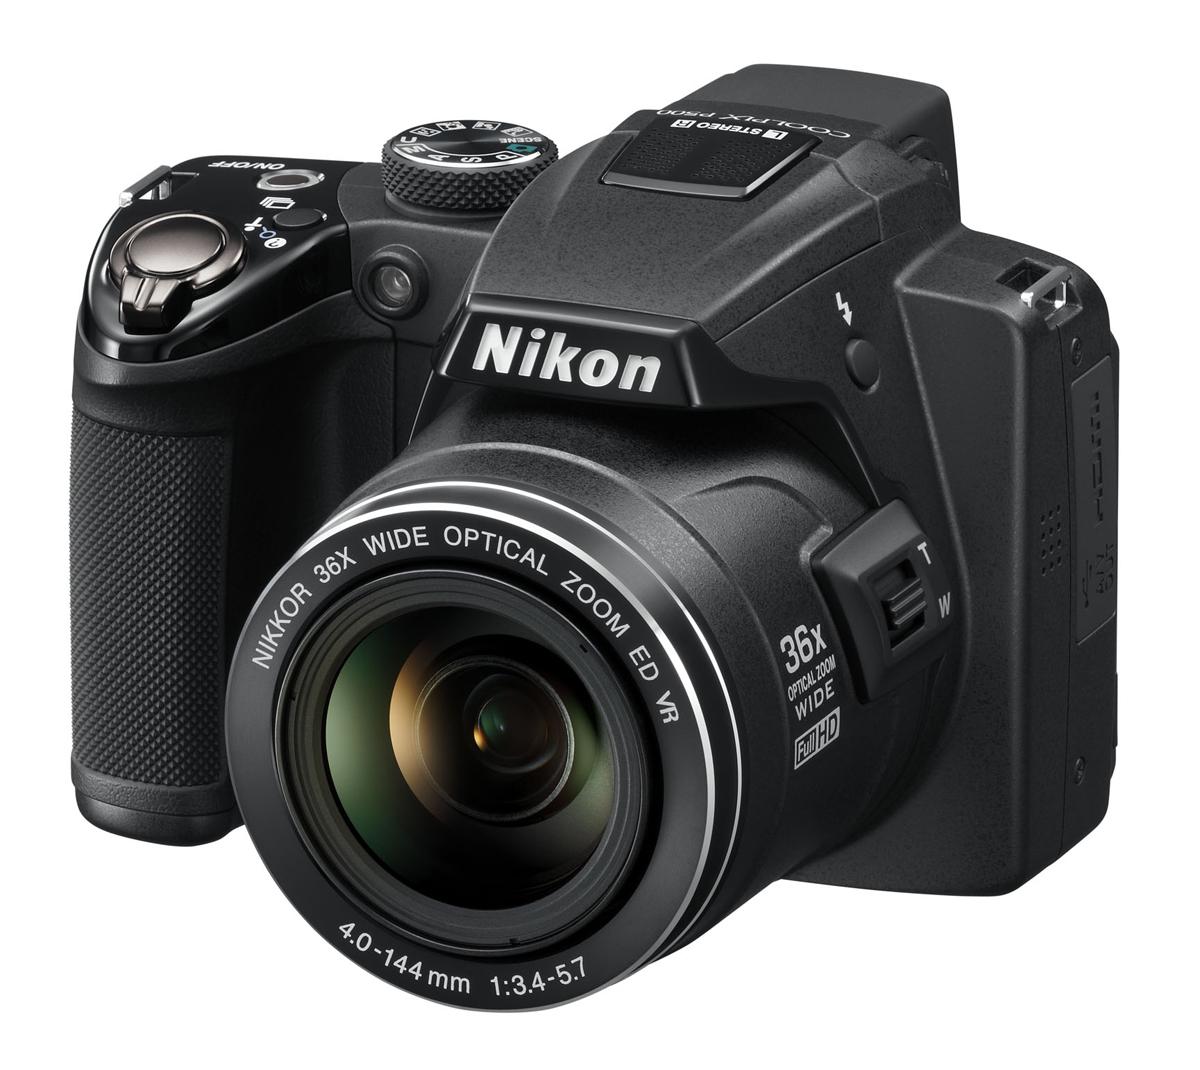 1f061a4c33 Nikon Coolpix P500